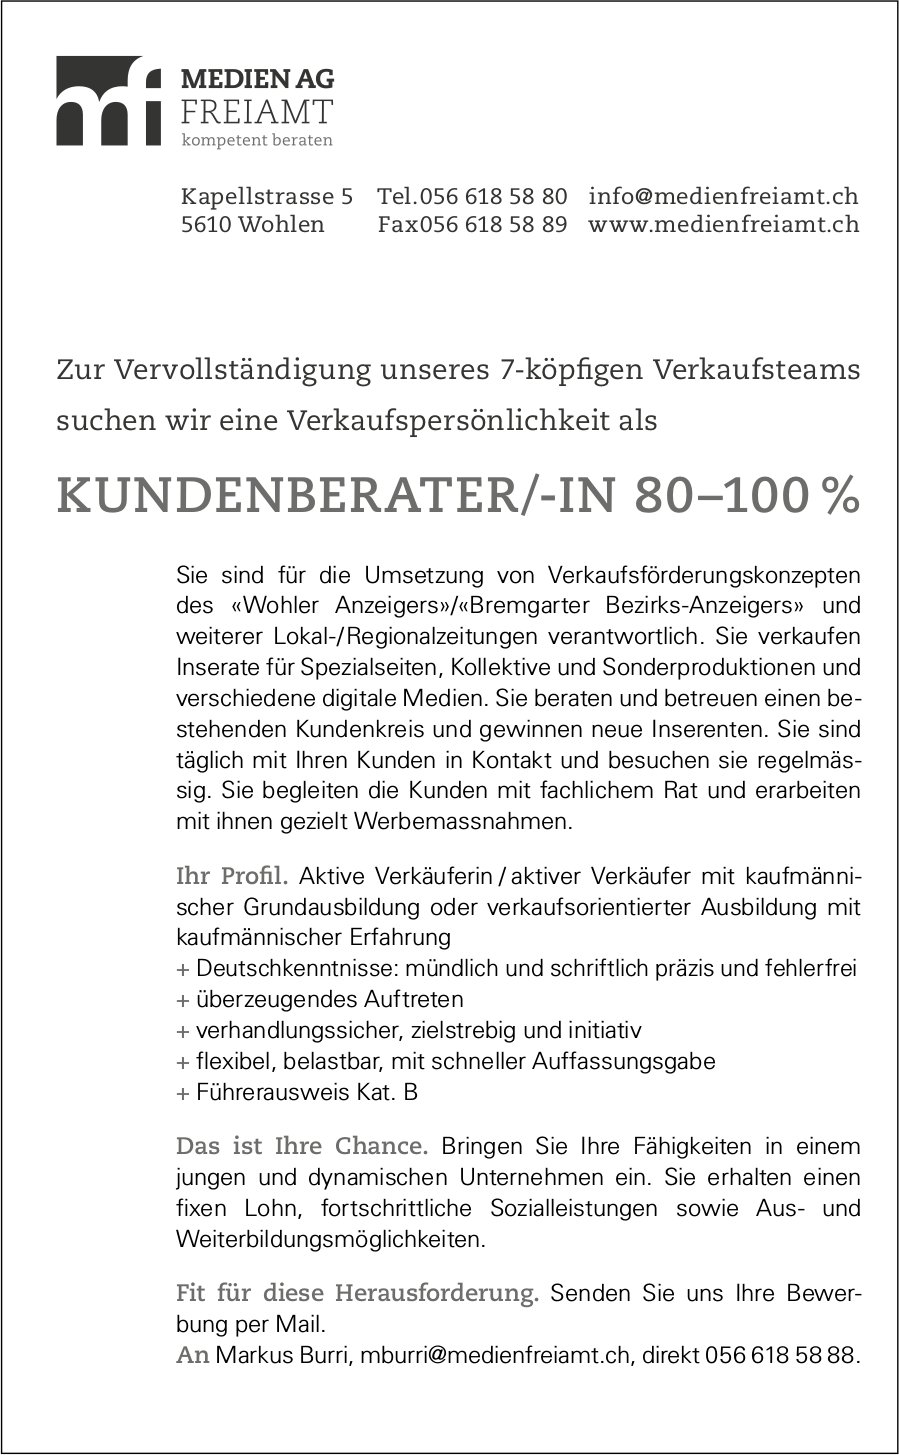 Kundenberater/-in, 80-100%, Medien AG Freiamt